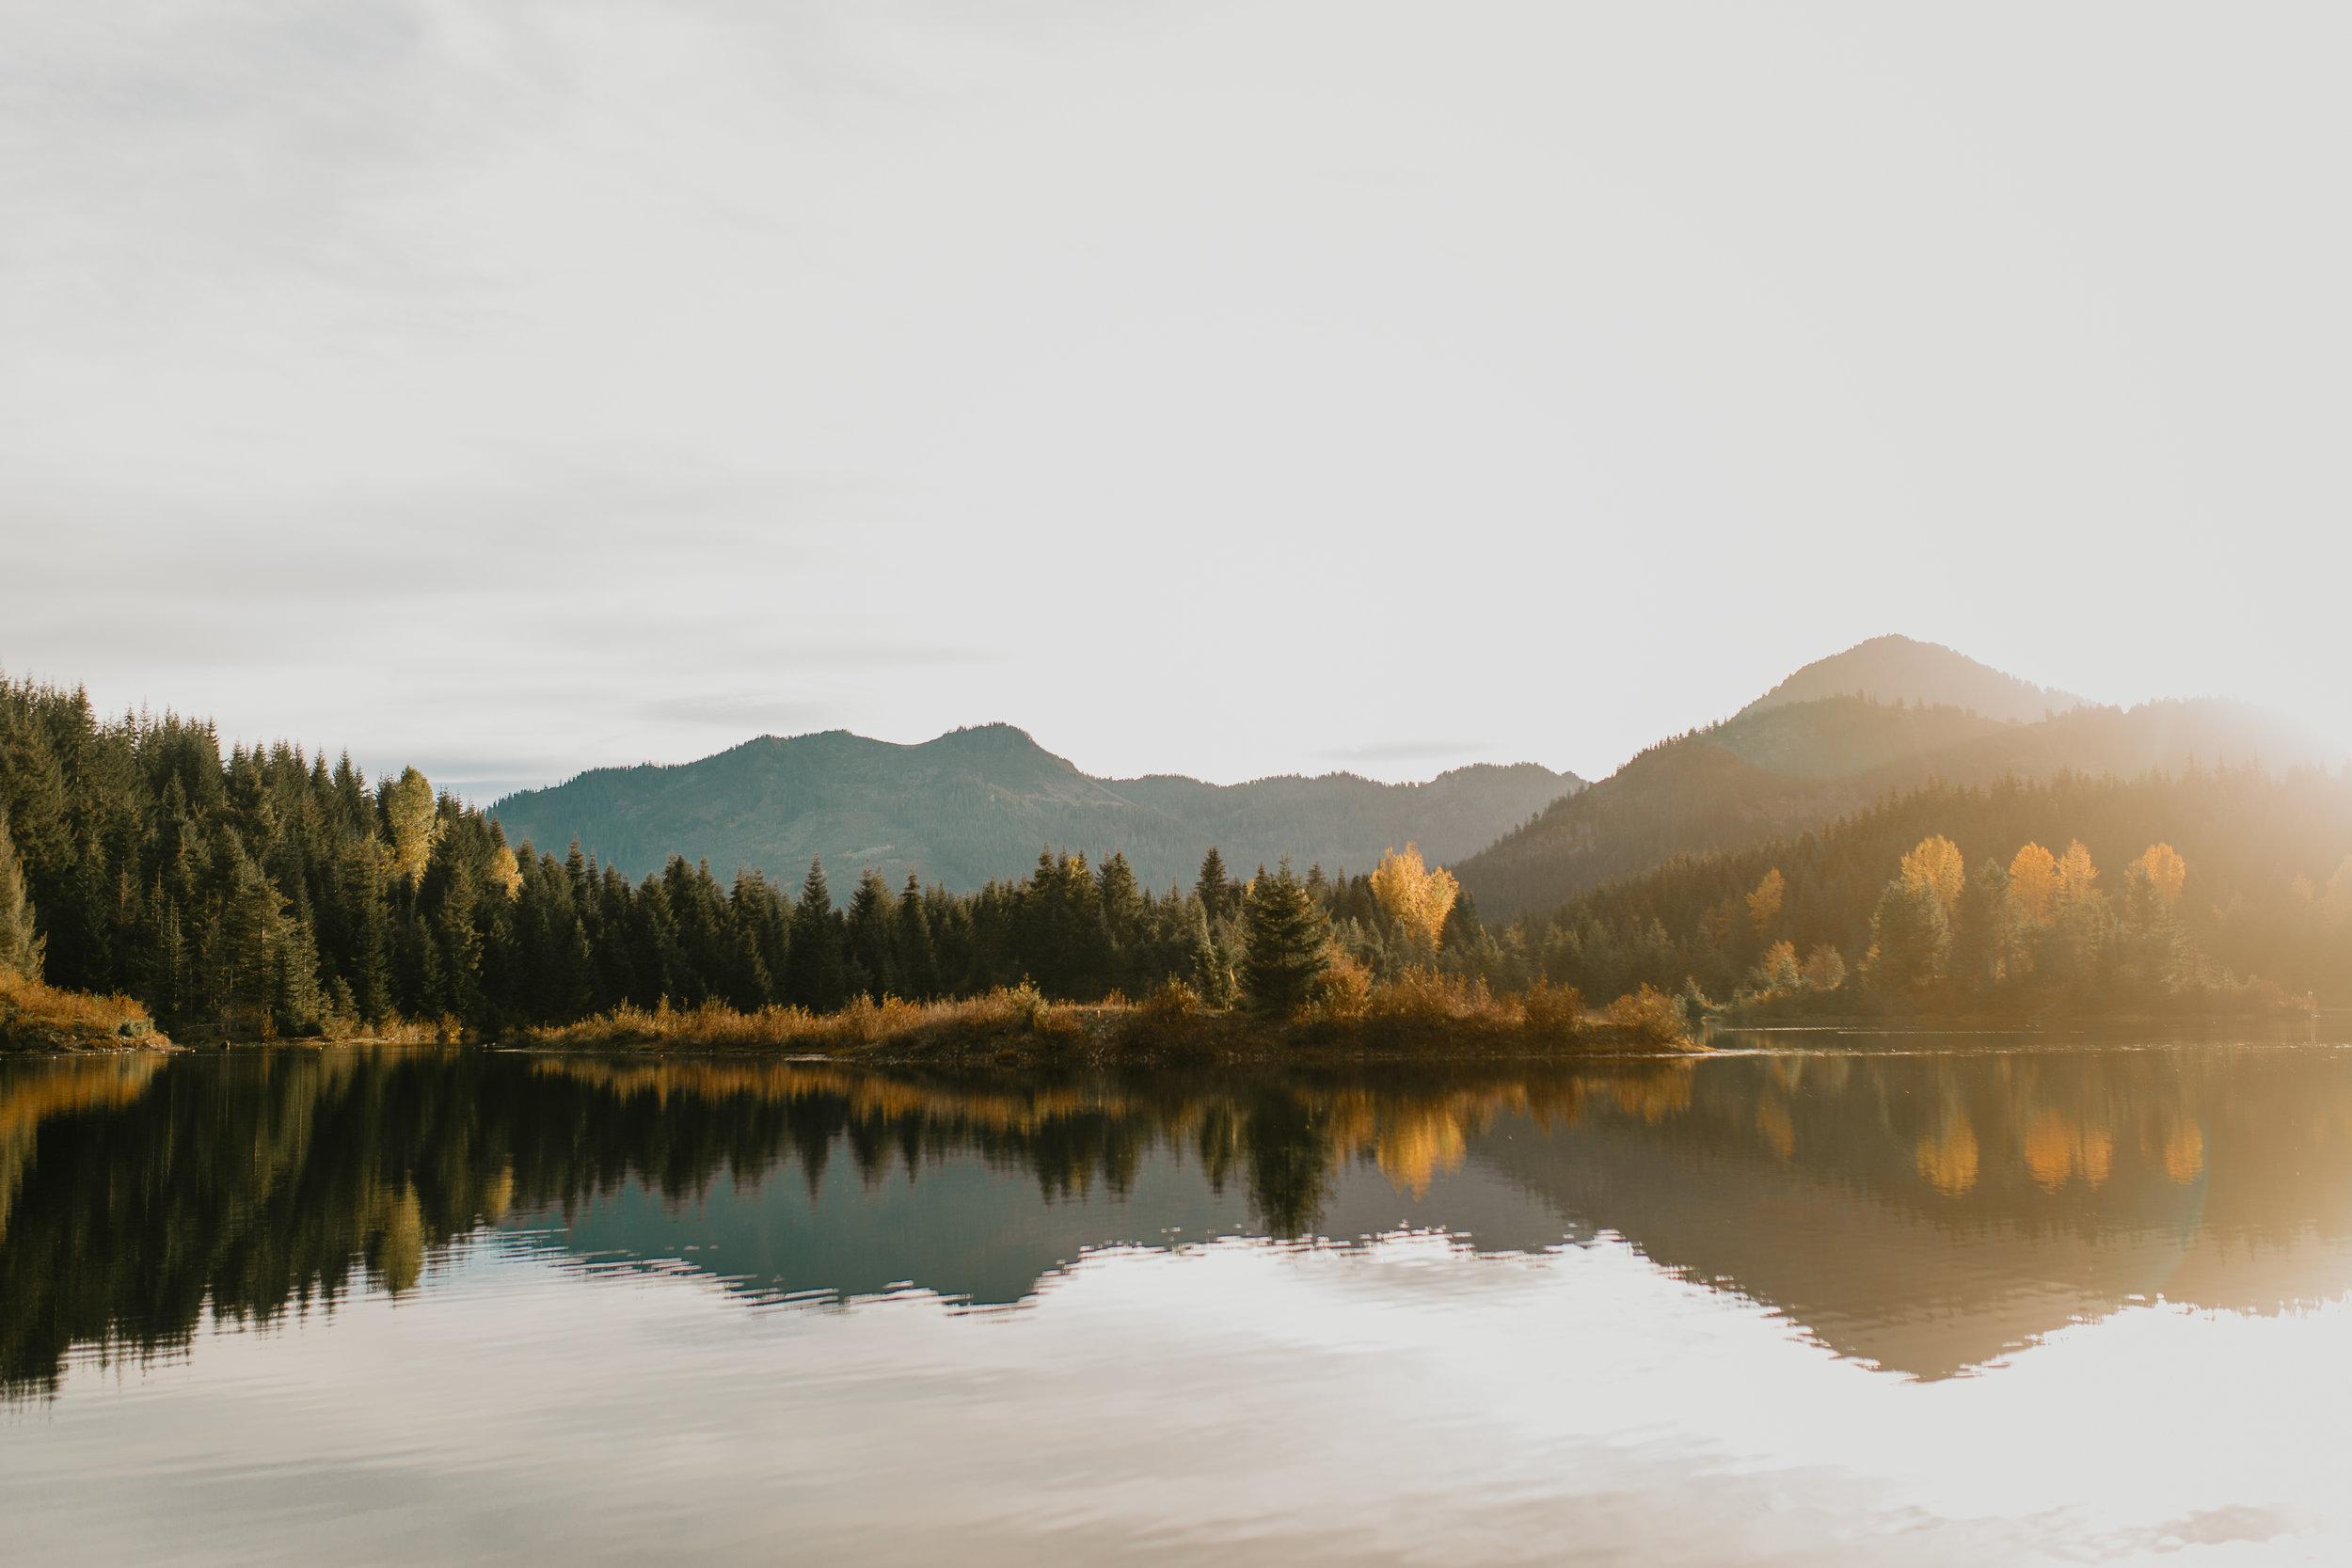 nicole-daacke-photography-mountain-view-elopement-at-gold-creek-pond-snoqualmie-washington-wa-elopement-photographer-photography-adventure-elopement-in-washington-fall-lakeside-golden-sunset-boho-fun-bride-0309.jpg